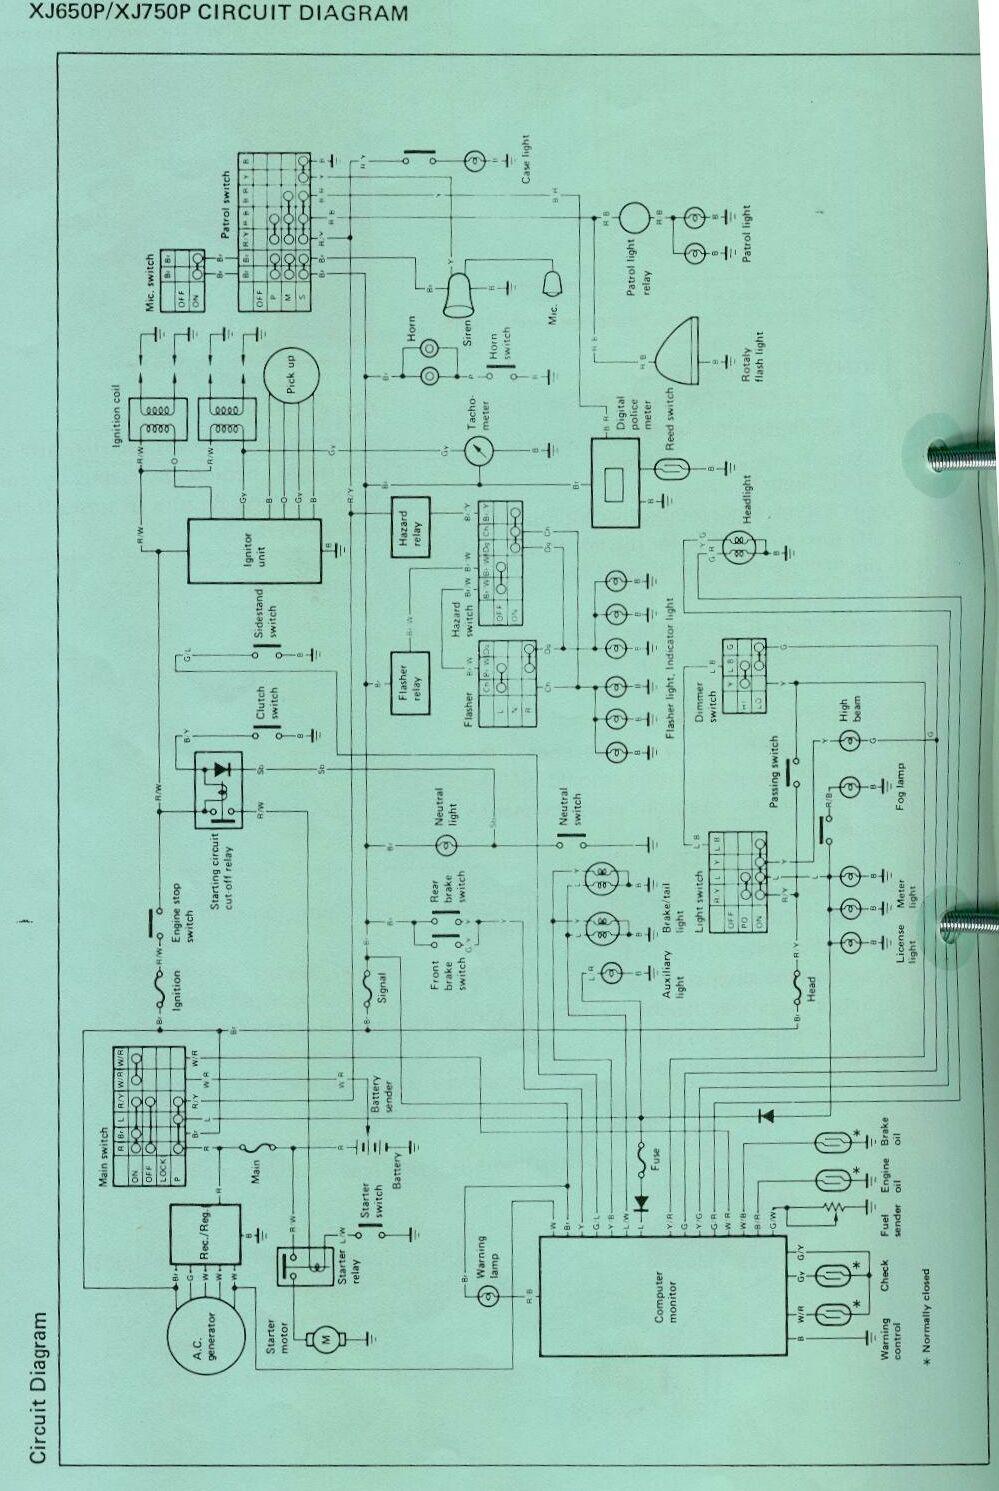 d12a  Xj Wiring Diagram on transformer diagrams, pinout diagrams, hvac diagrams, electrical diagrams, electronic circuit diagrams, led circuit diagrams, friendship bracelet diagrams, motor diagrams, sincgars radio configurations diagrams, engine diagrams, smart car diagrams, switch diagrams, lighting diagrams, internet of things diagrams, gmc fuse box diagrams, battery diagrams, troubleshooting diagrams, honda motorcycle repair diagrams, series and parallel circuits diagrams,